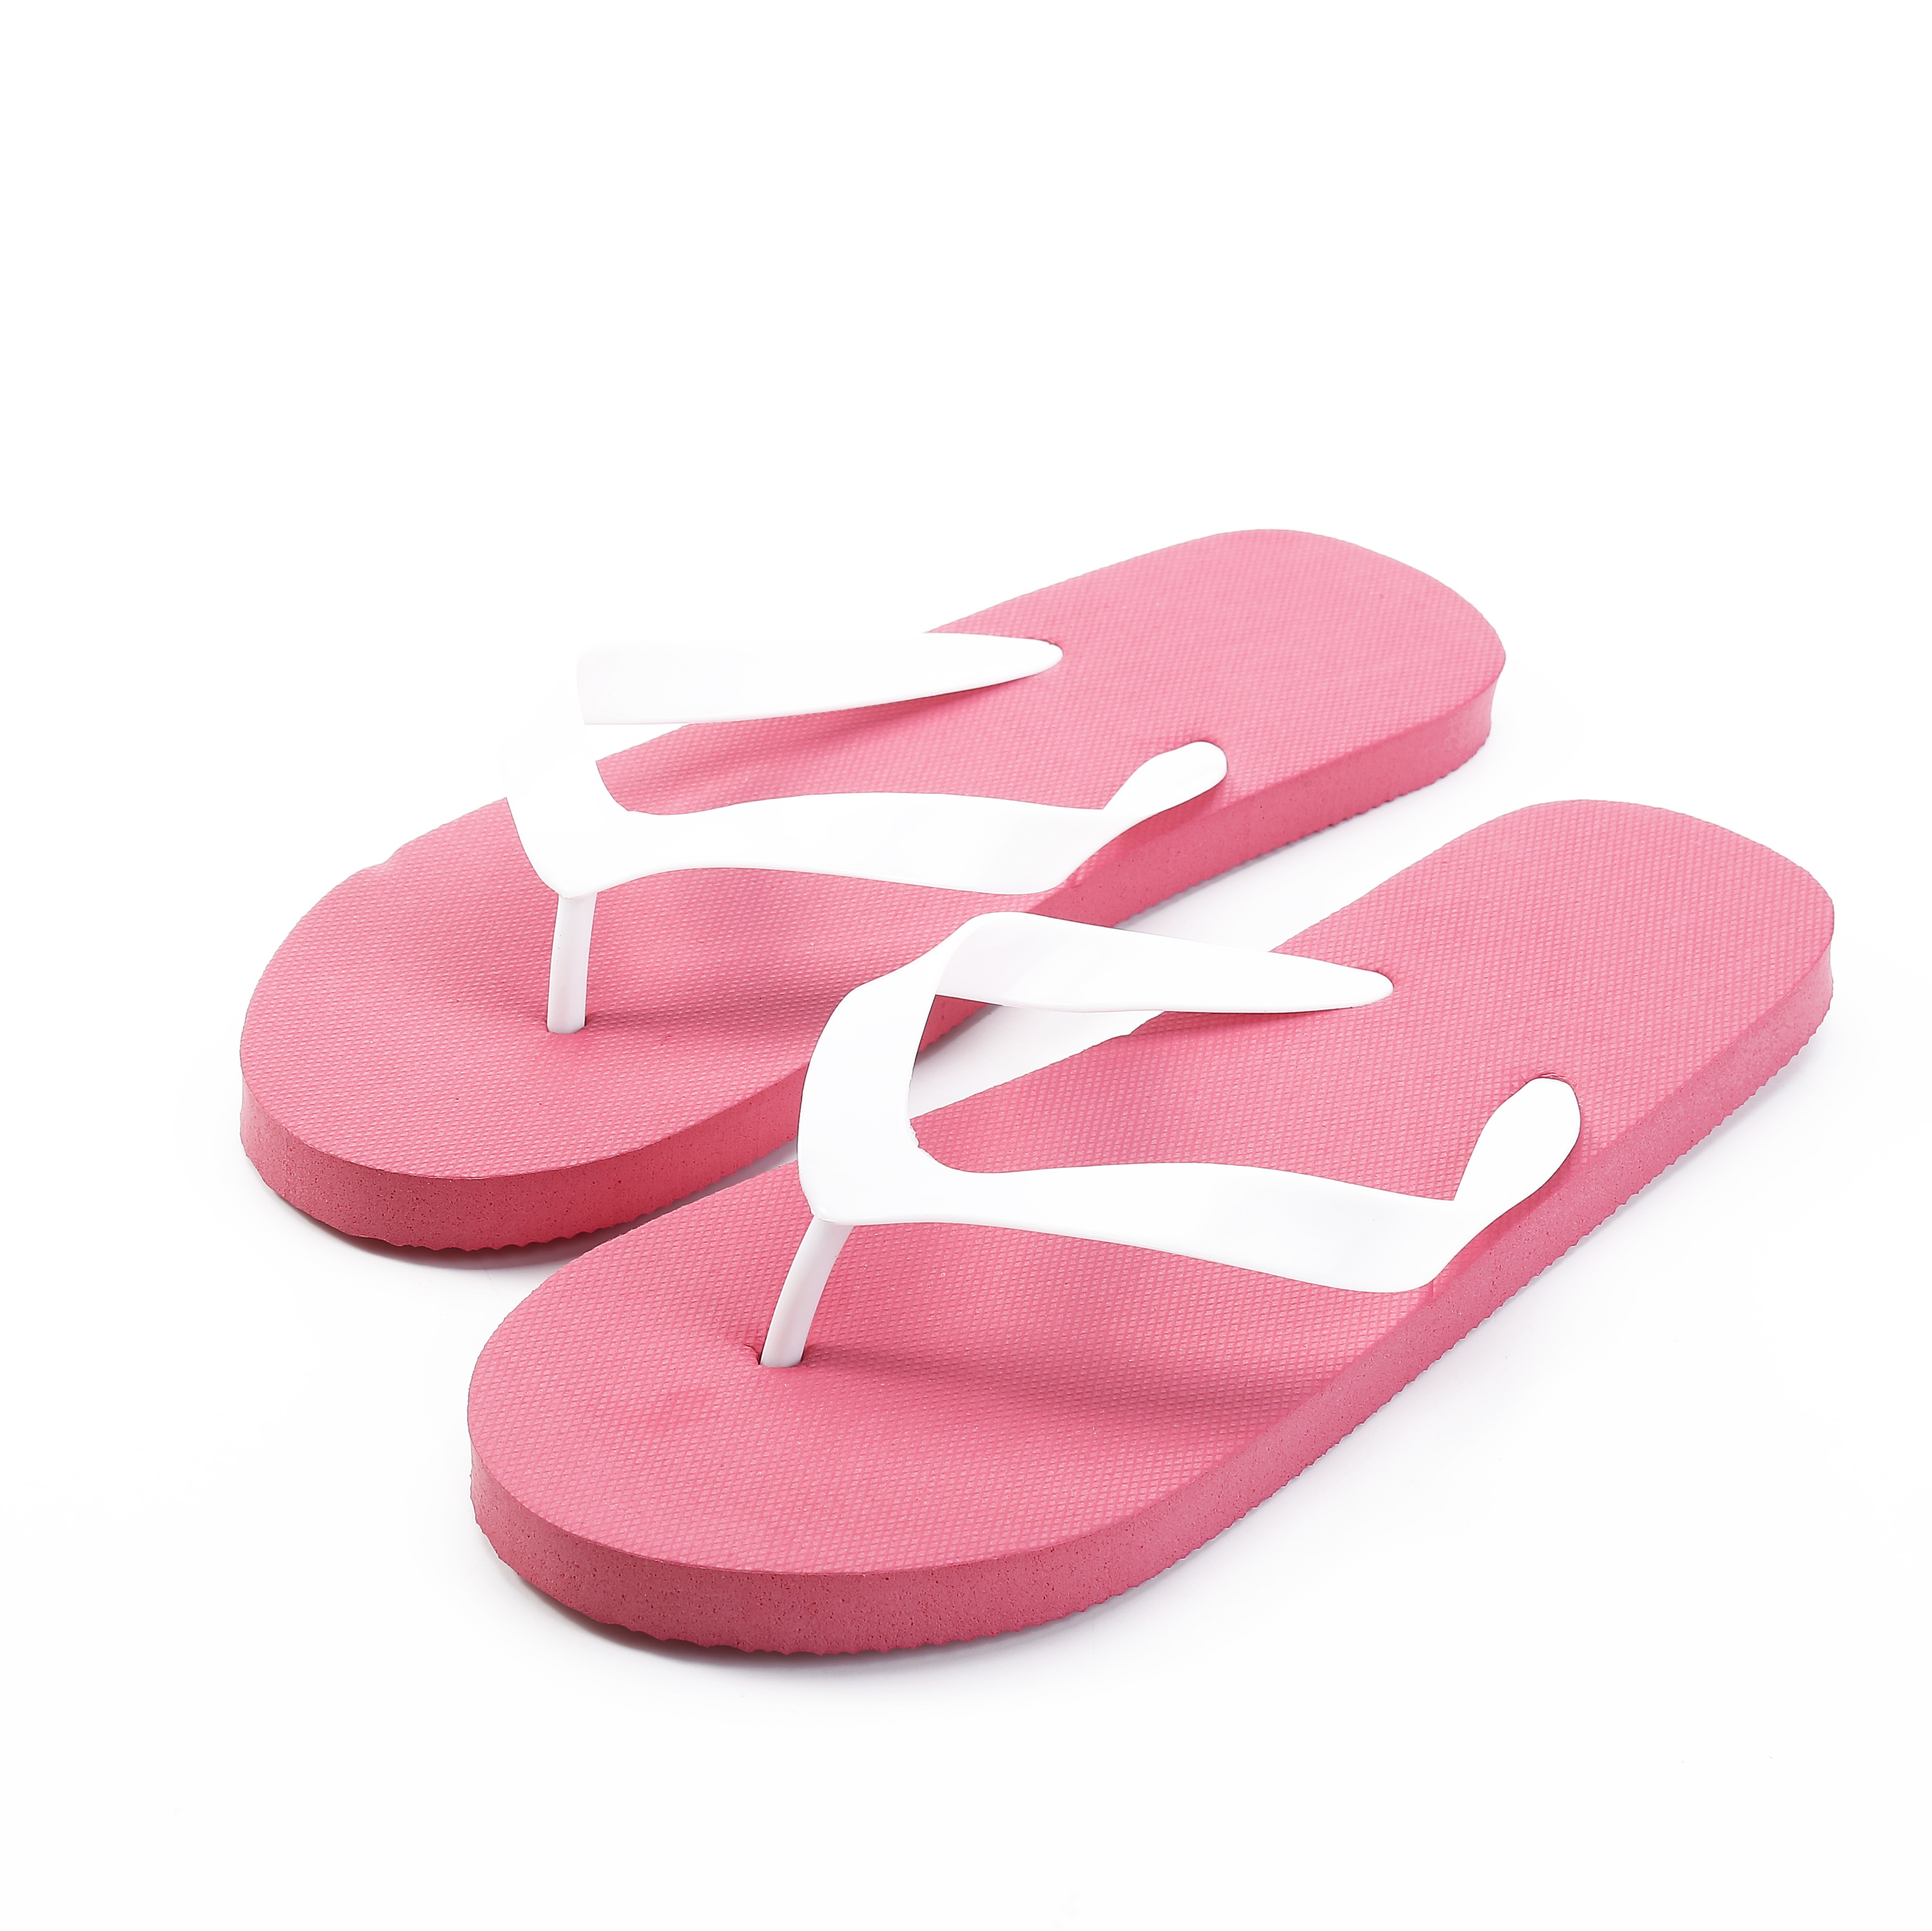 14201fe3731e China beach slippers wholesale 🇨🇳 - Alibaba